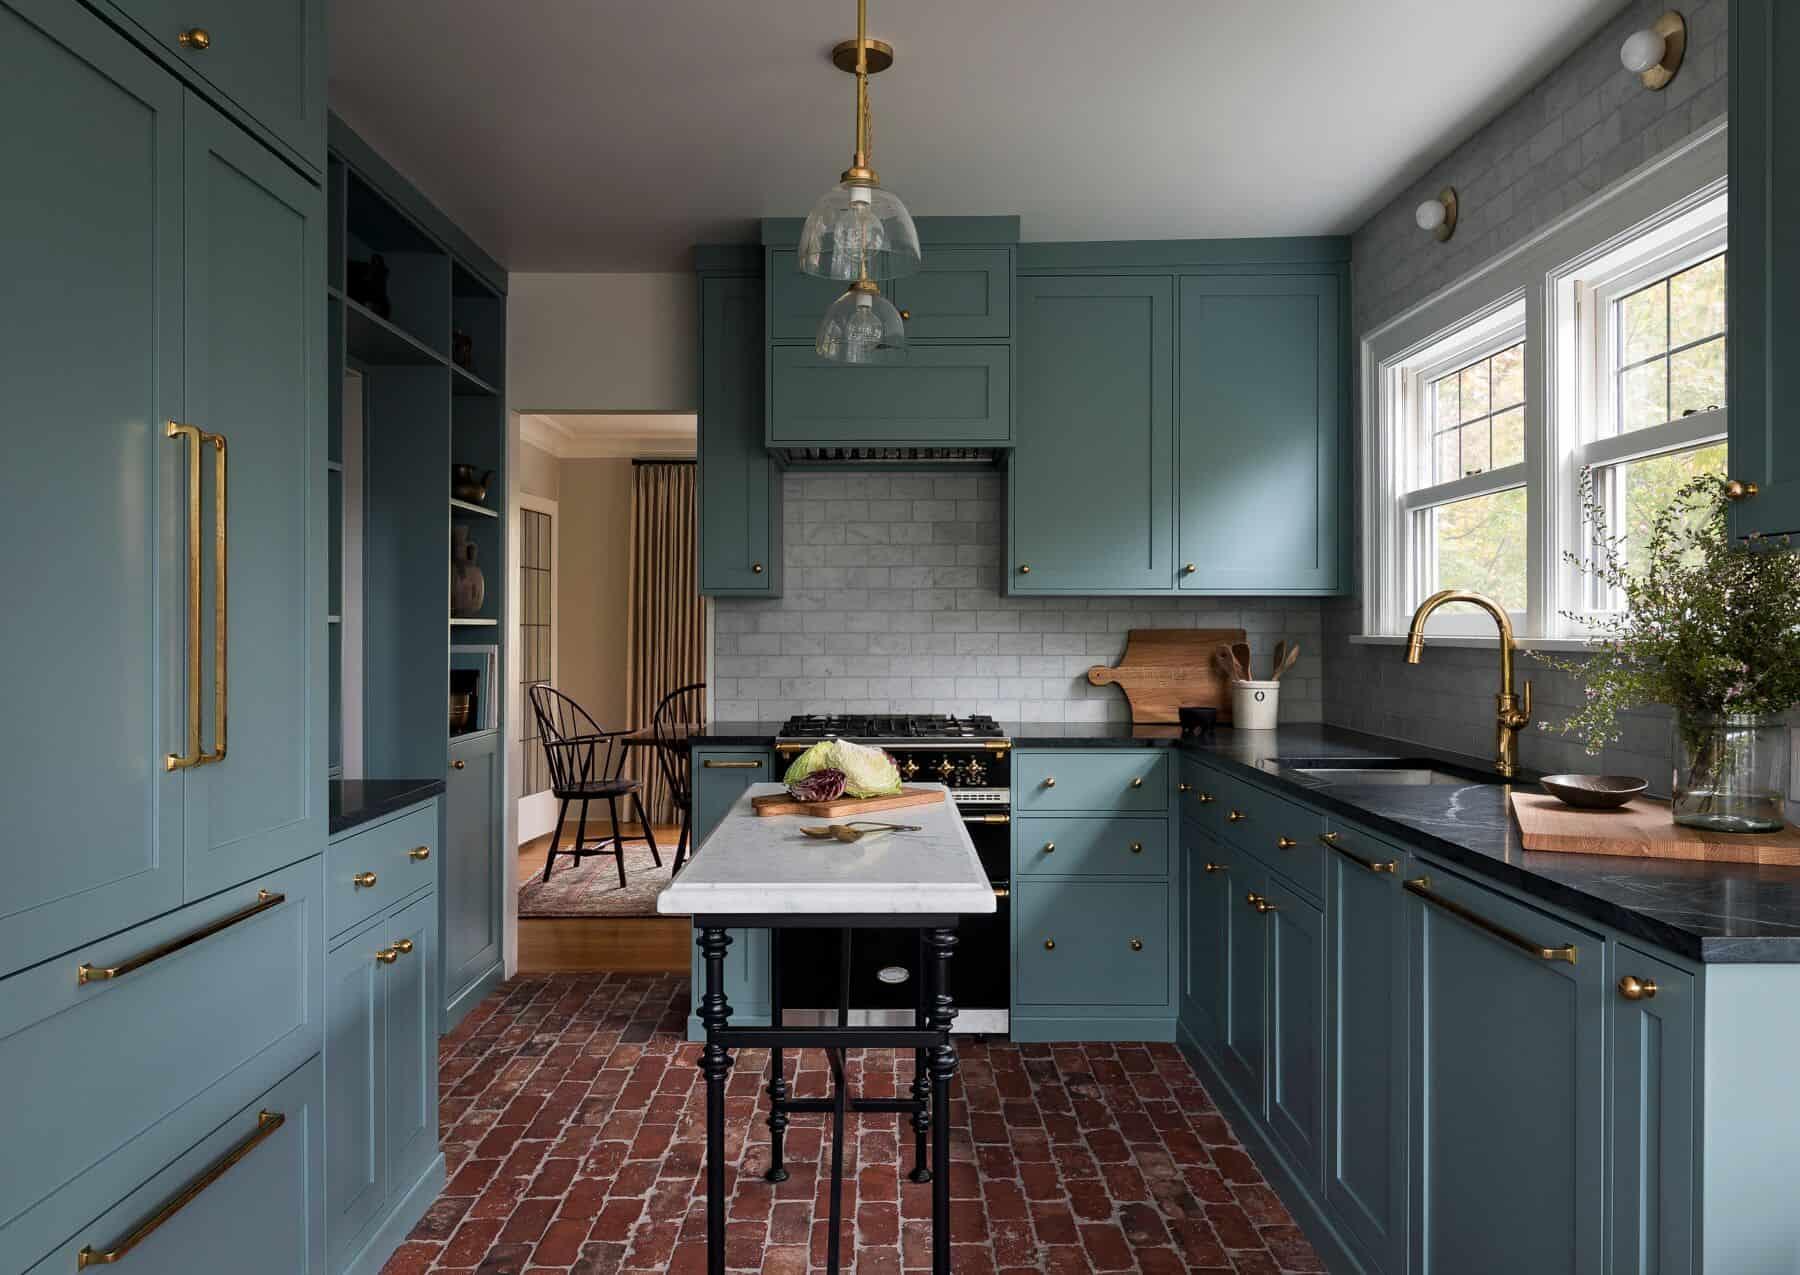 Heidi Caillier Design Seattle Interior Designer Pnw Tudor Kitchen Remodel Heidi Caillier